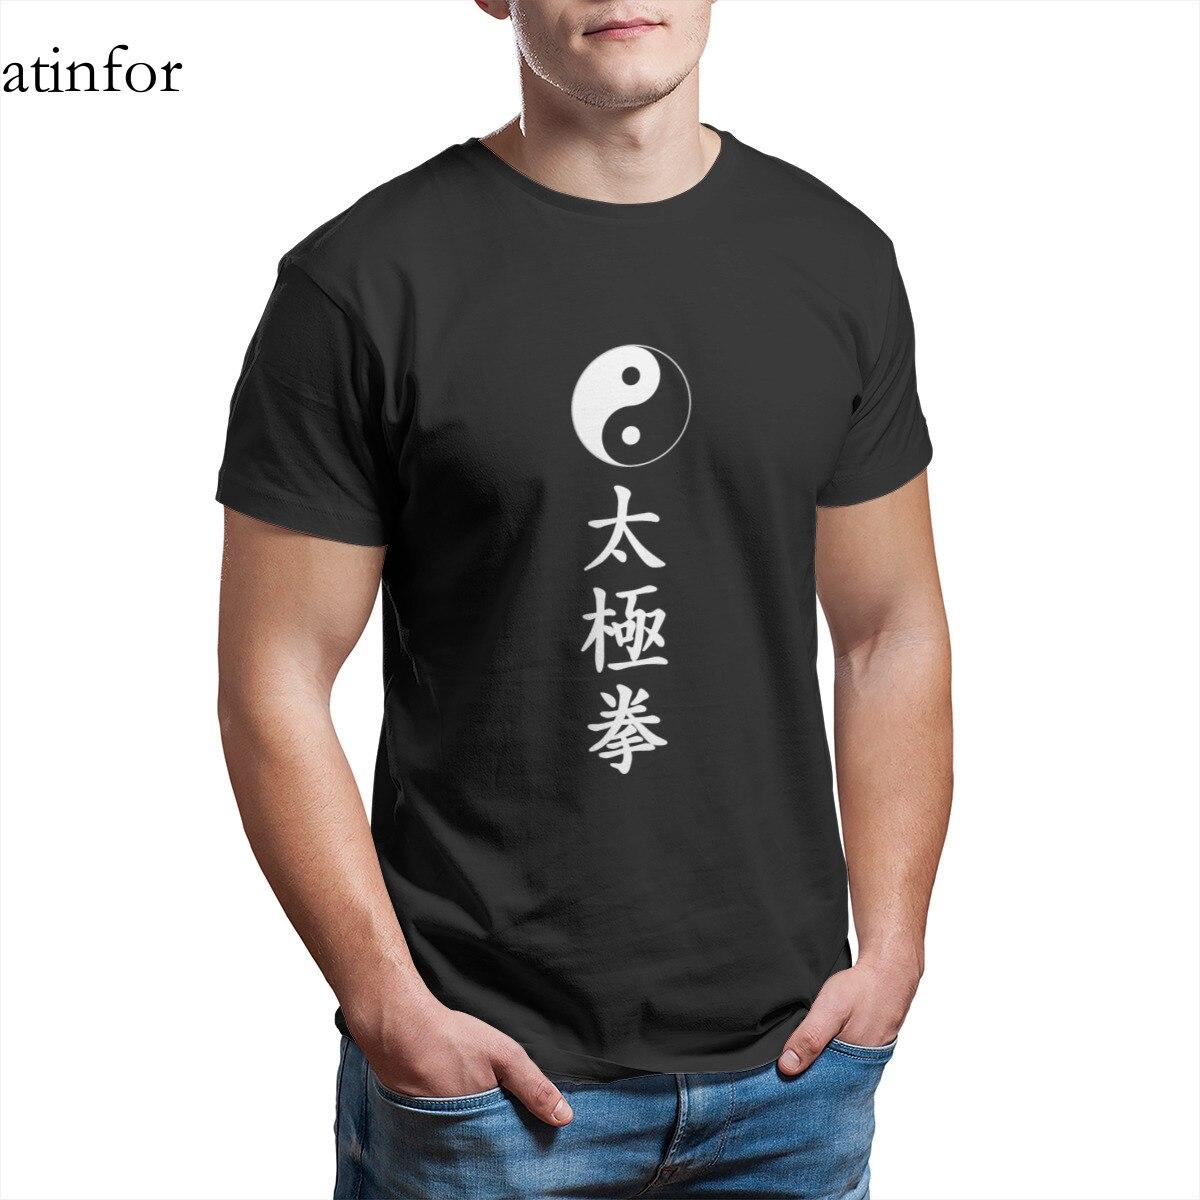 Футболка Tai Chi Chuan yin yang модная черная парная подходящая Мужская Ретро одежда в стиле панк 17459|Футболки| | АлиЭкспресс